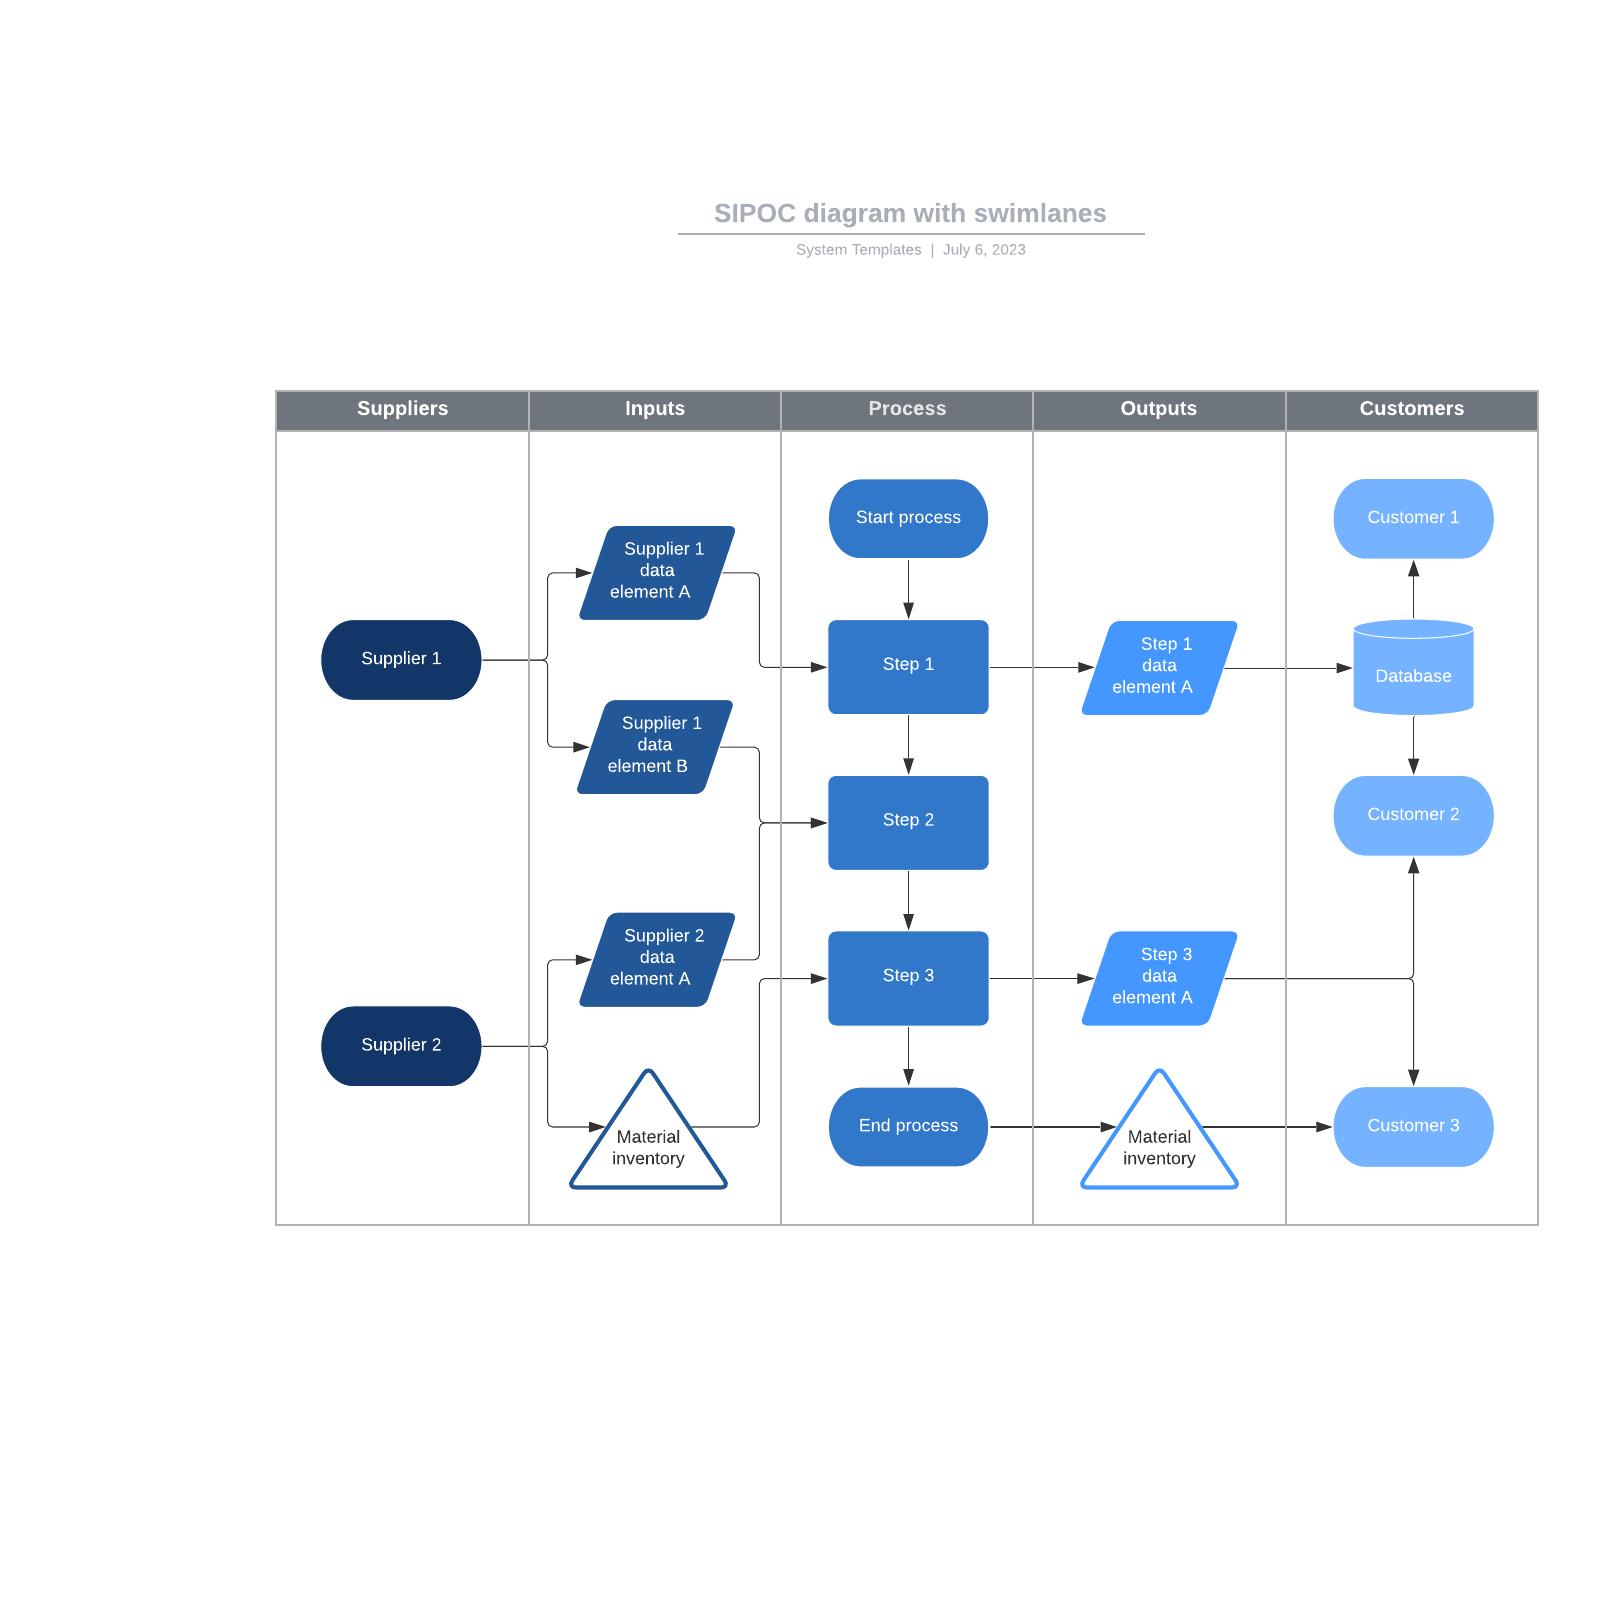 SIPOC diagram with swimlanes